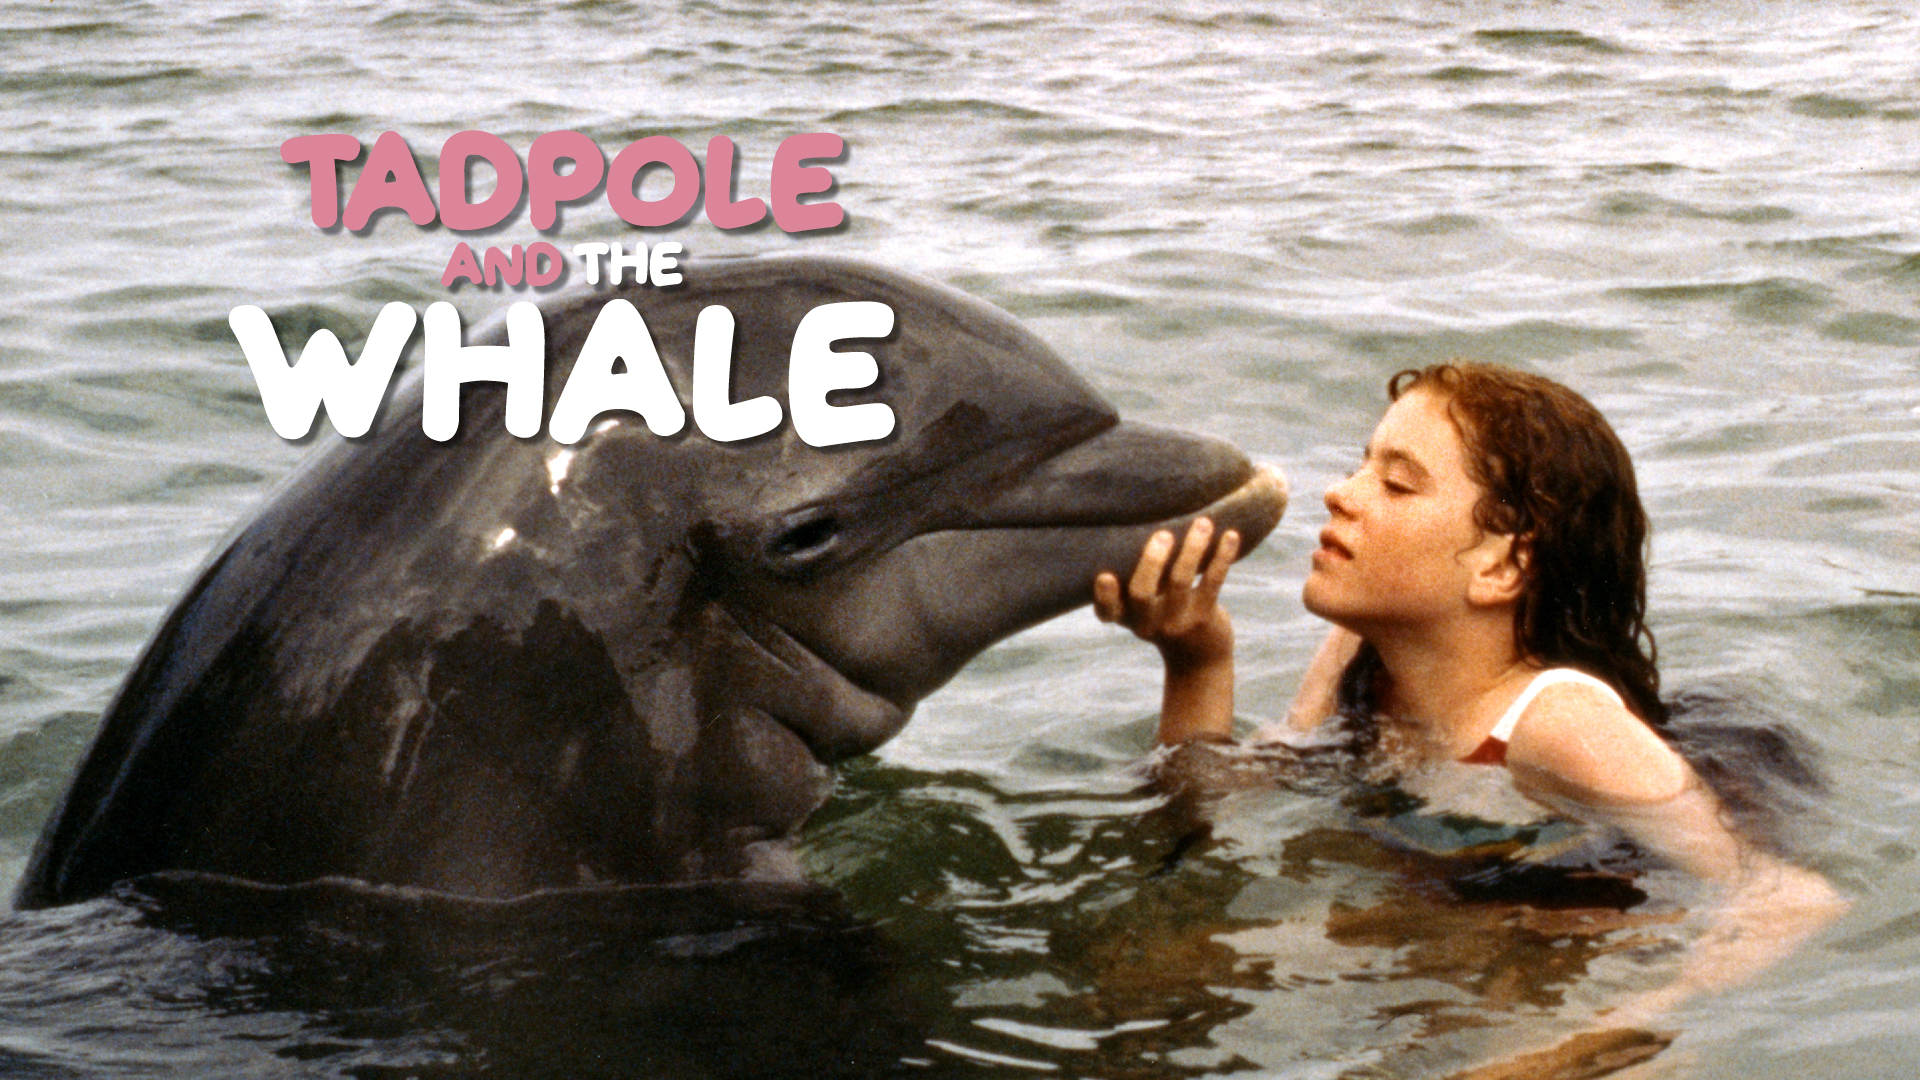 The Tadpole & The Whale